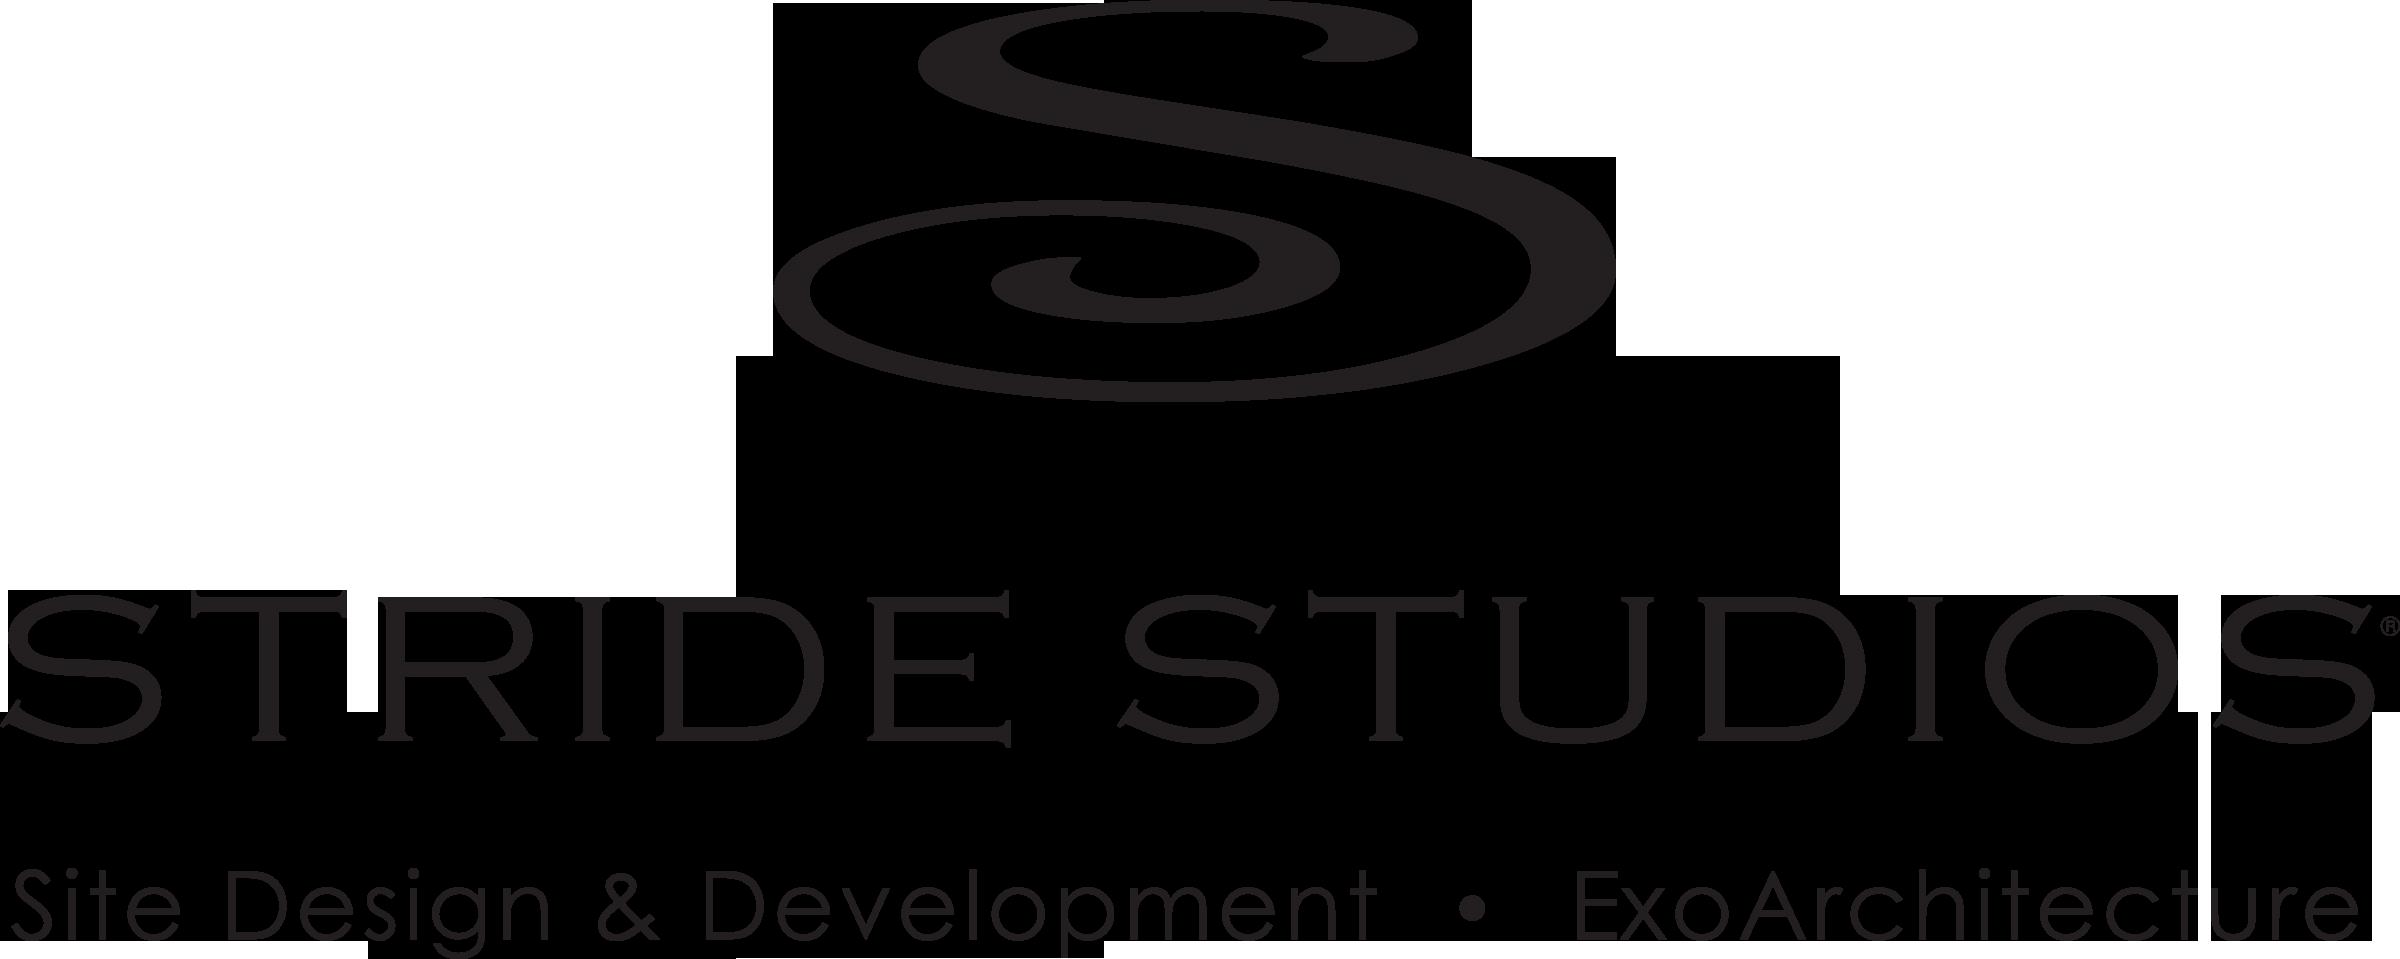 stride-studios-2019-site-design-development-exo-architecture.png